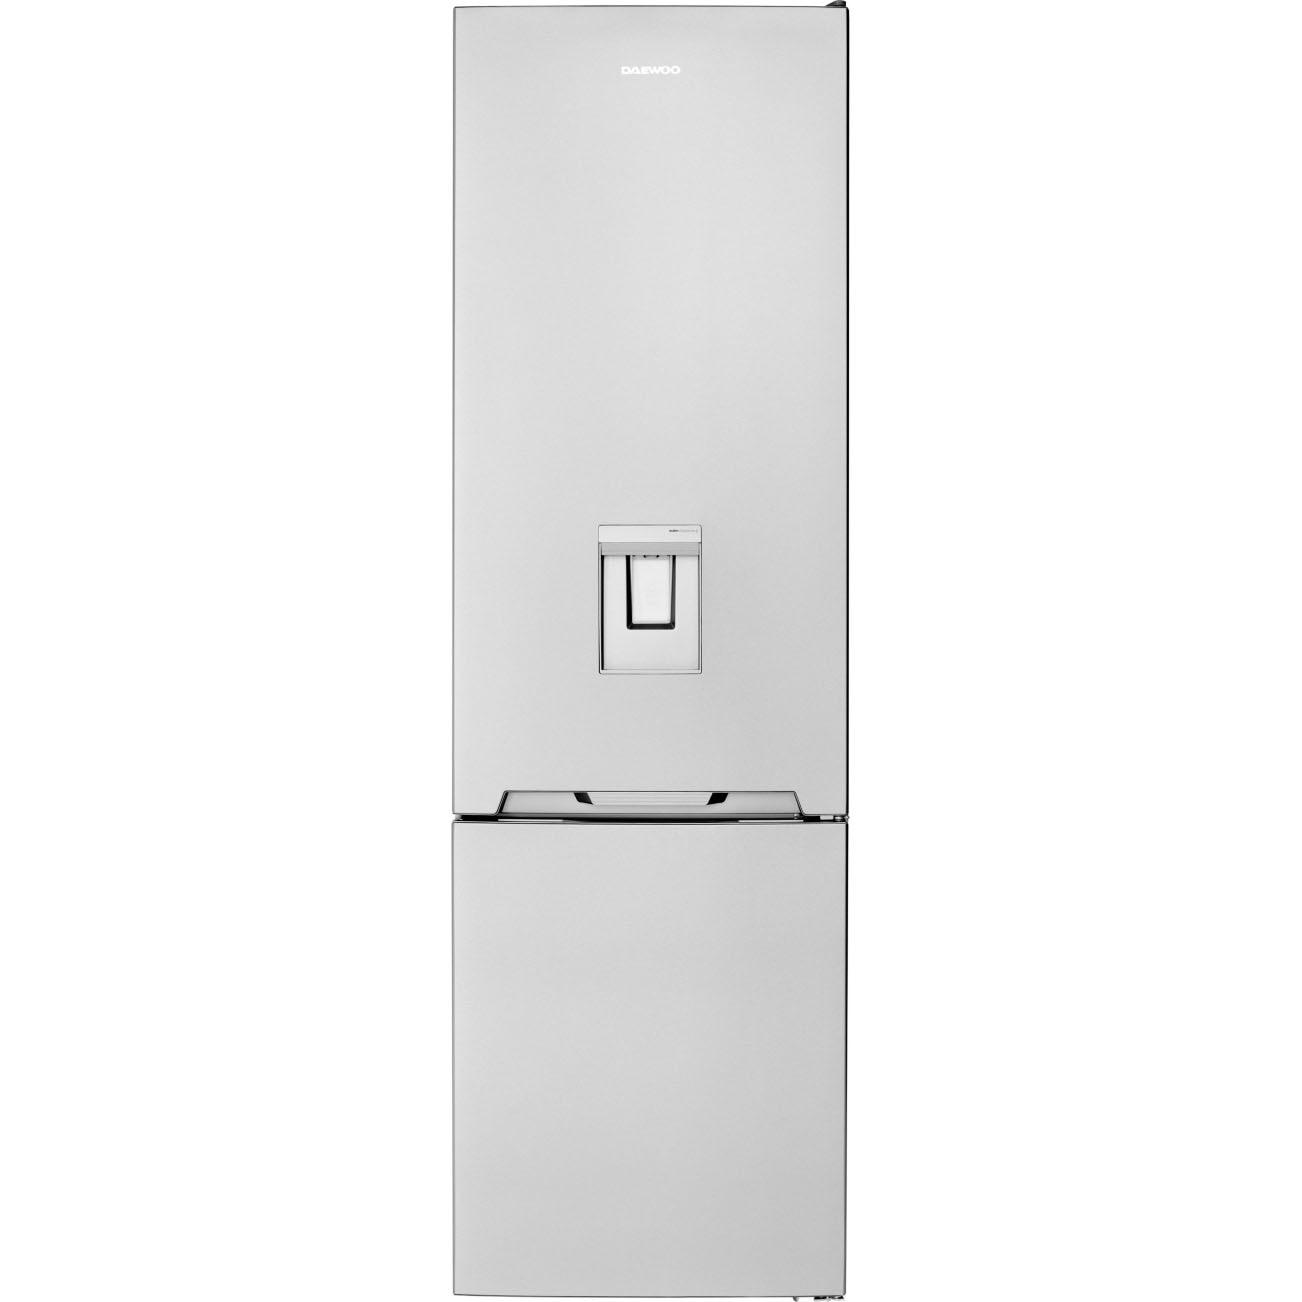 Fotografie Combina frigorifica Daewoo RN-308RDQM, 330l l net, Clasa E, No Frost, Dispenser apa, H 187 cm, Inox